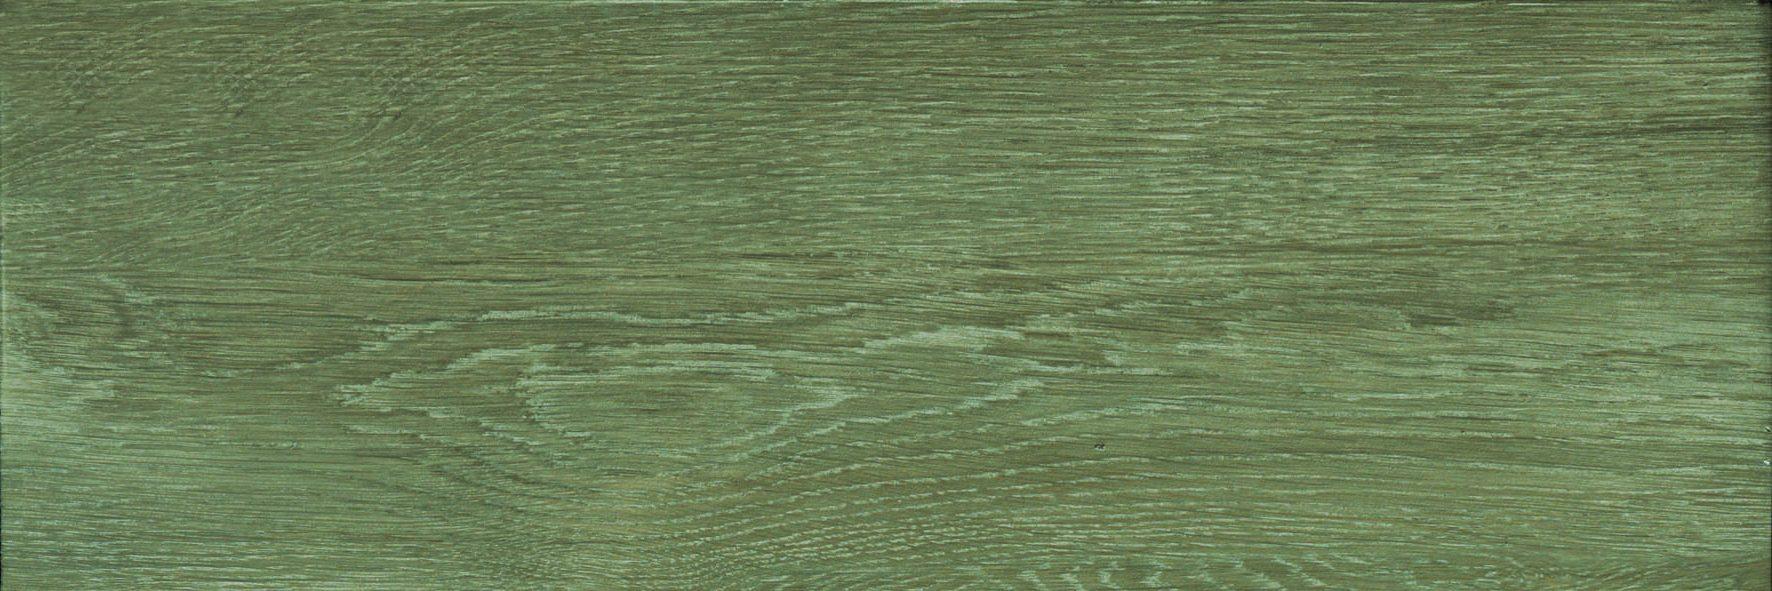 20x60,4 Elisir Olive 1